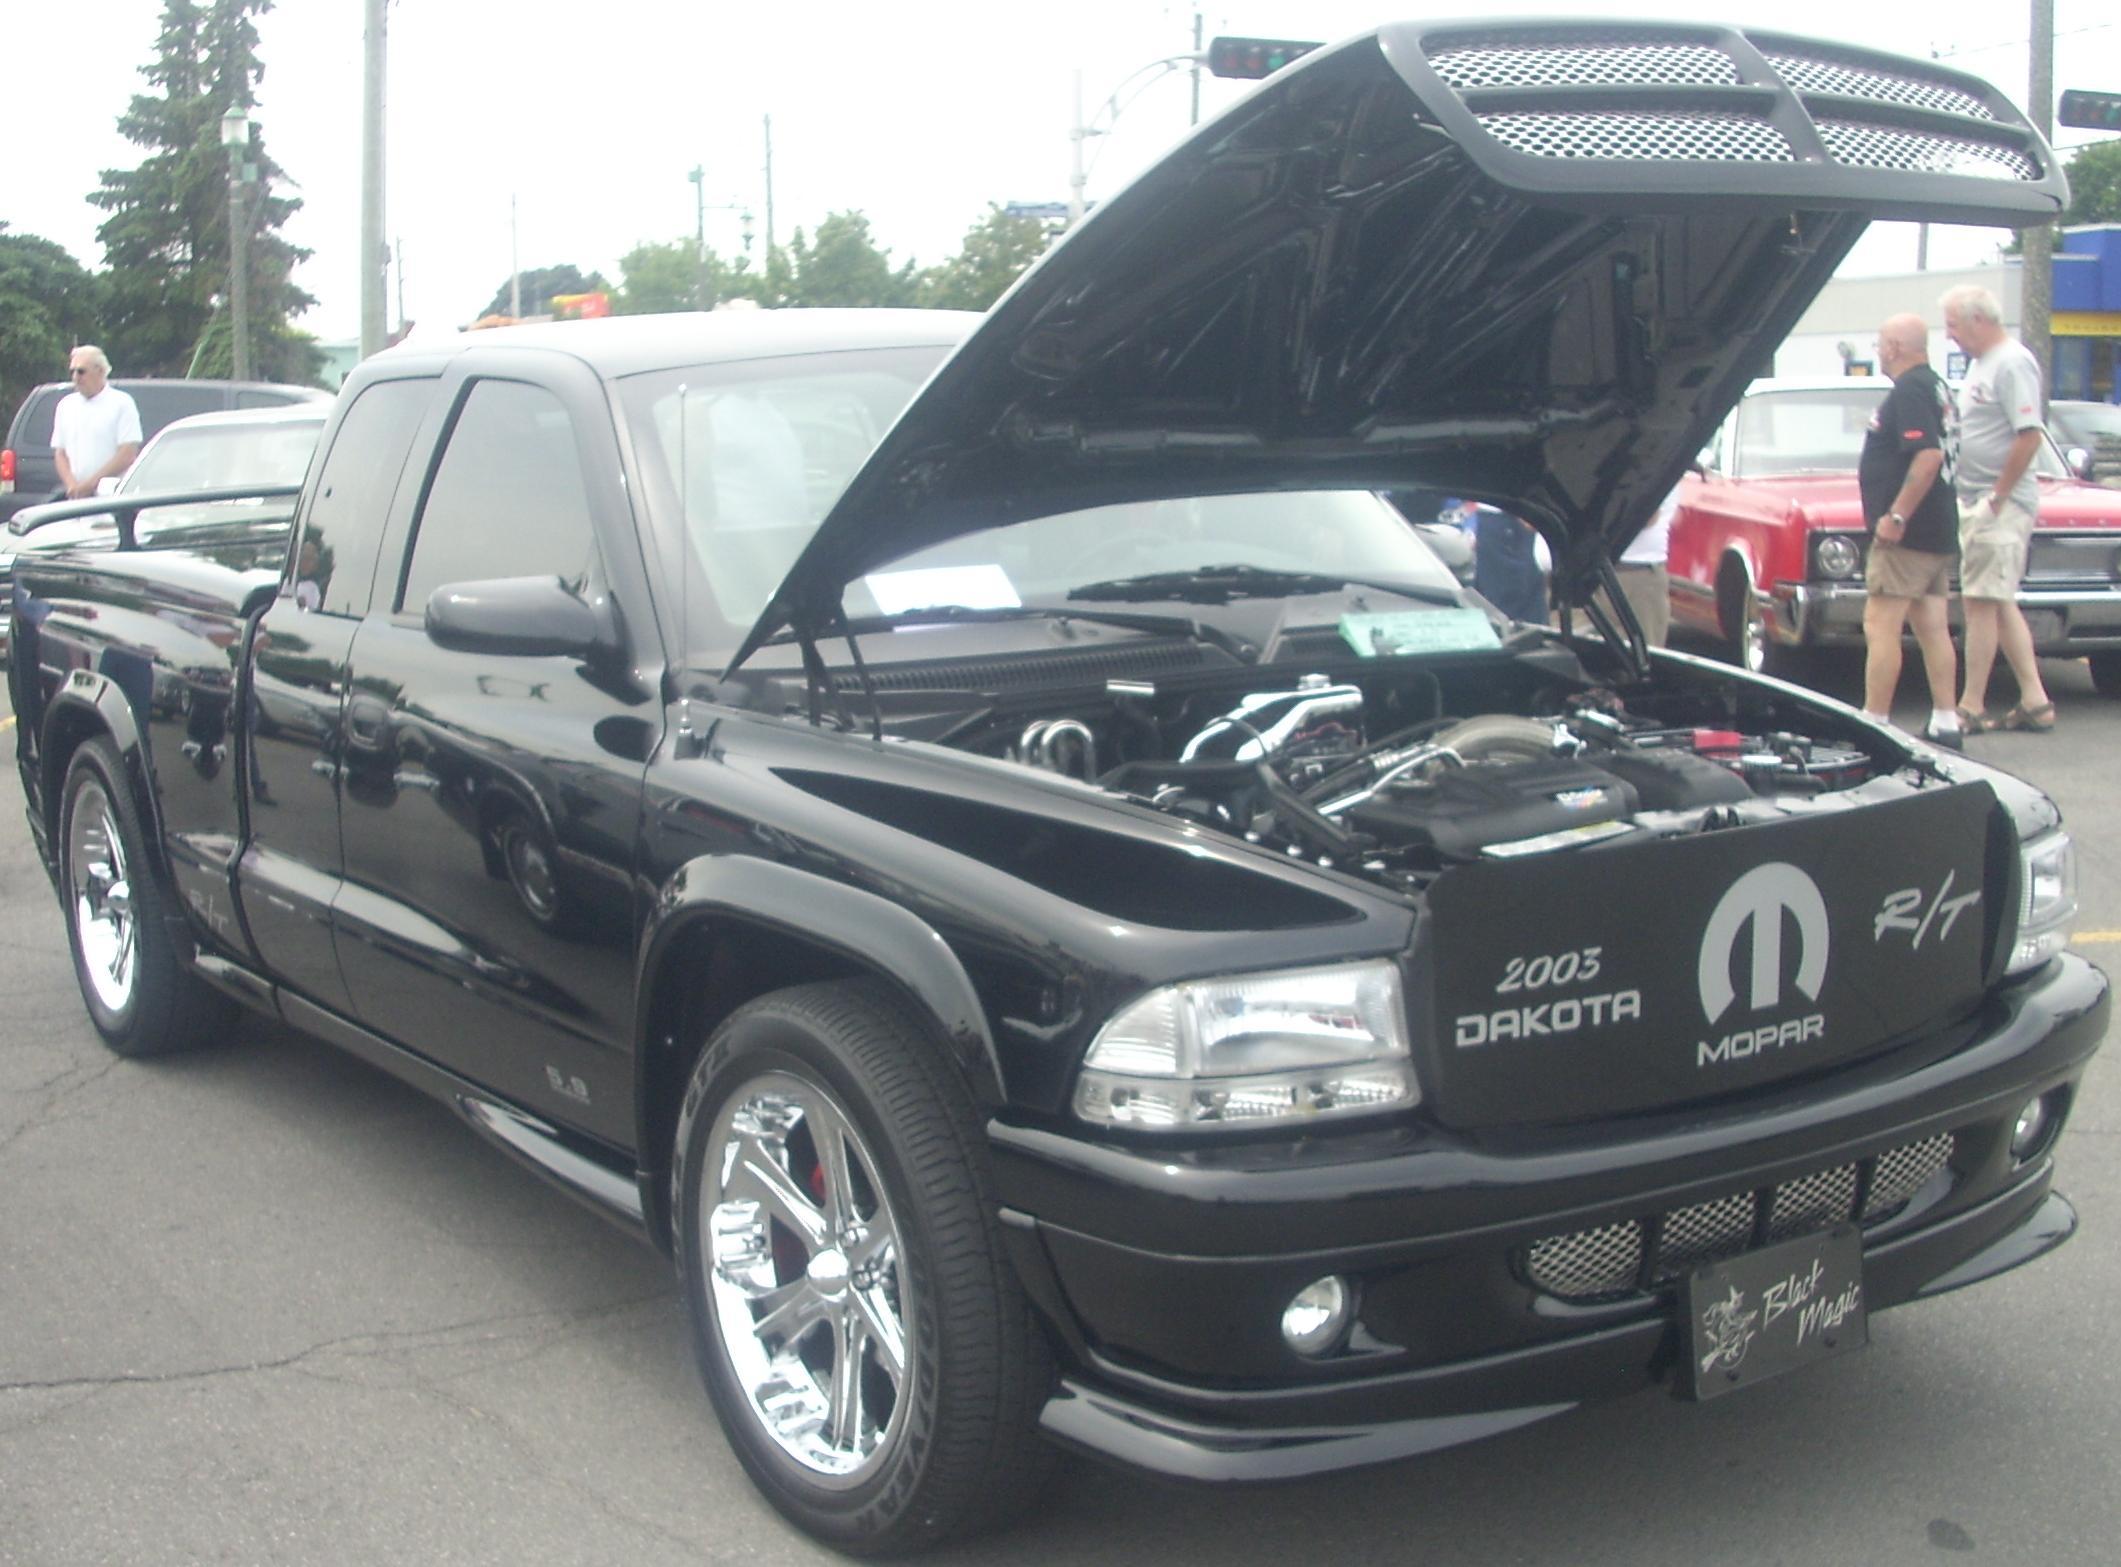 Dodge Dakota Mopar >> File Tuned 03 Dodge Dakota R T Rassemblement Mopar Valleyfield 10